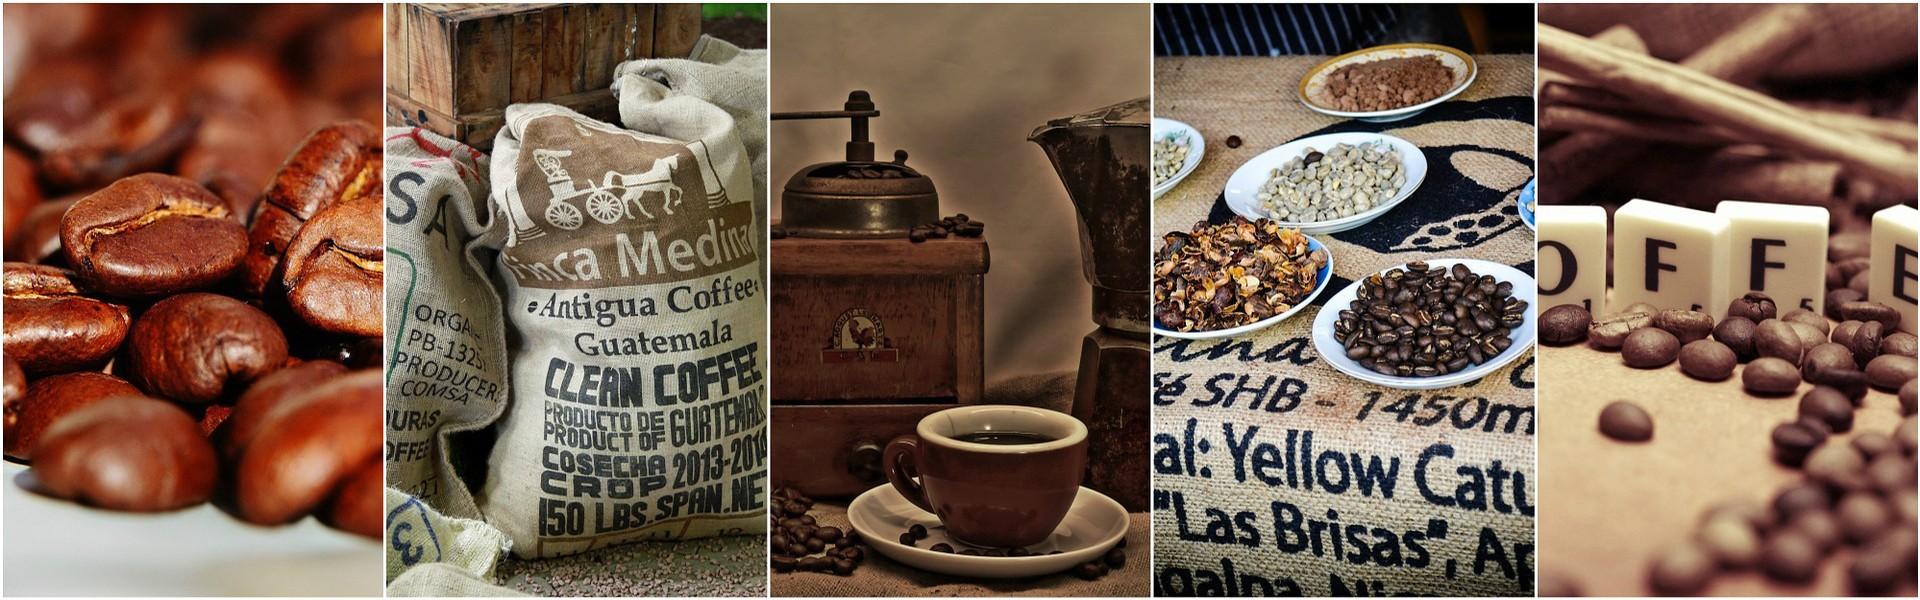 Tea & Coffee Emporium Welcome to the amazing world of tea and coffee